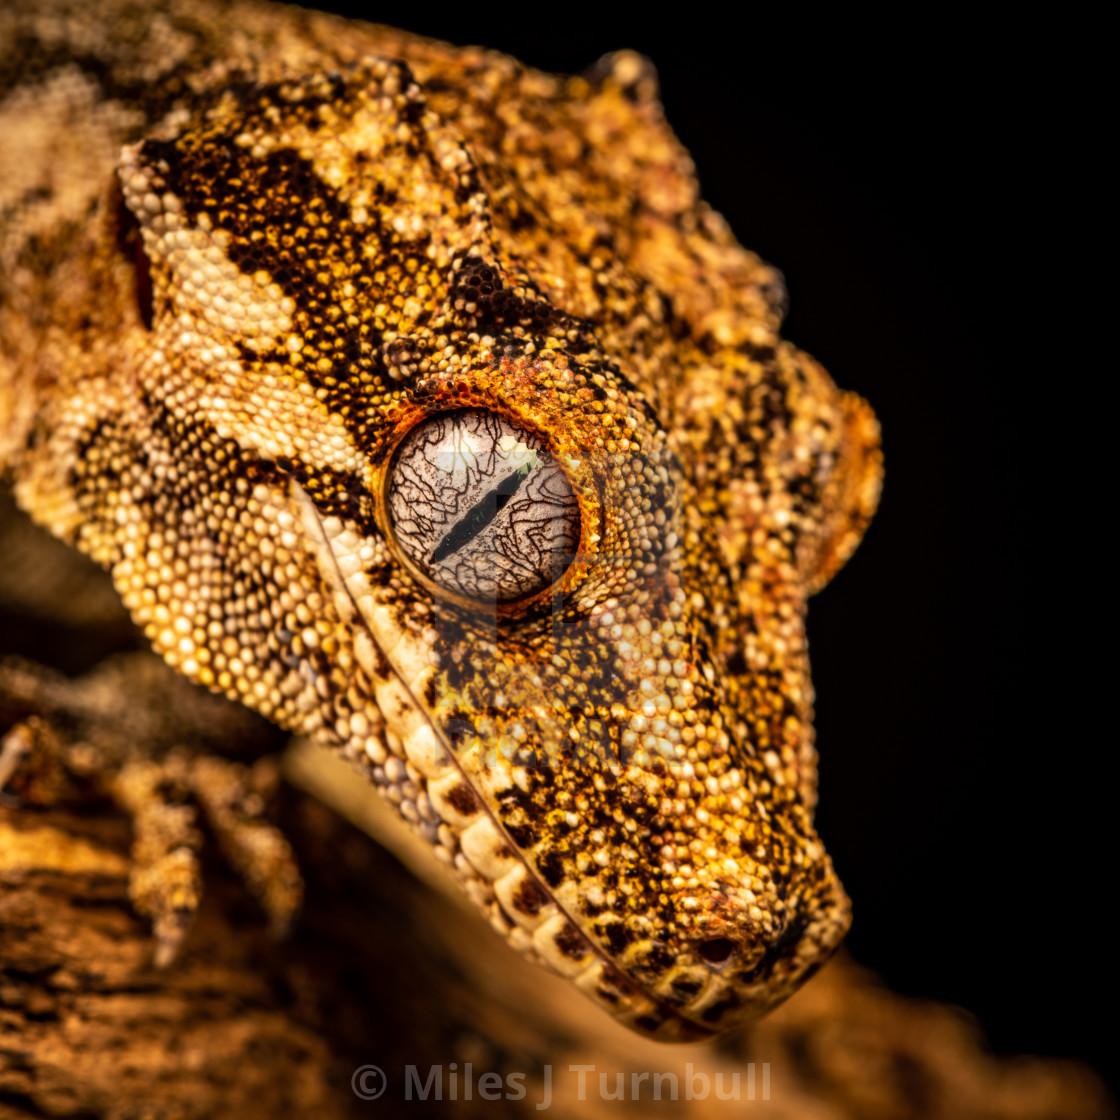 """Gargoyle Gecko, close-up of head and eye"" stock image"